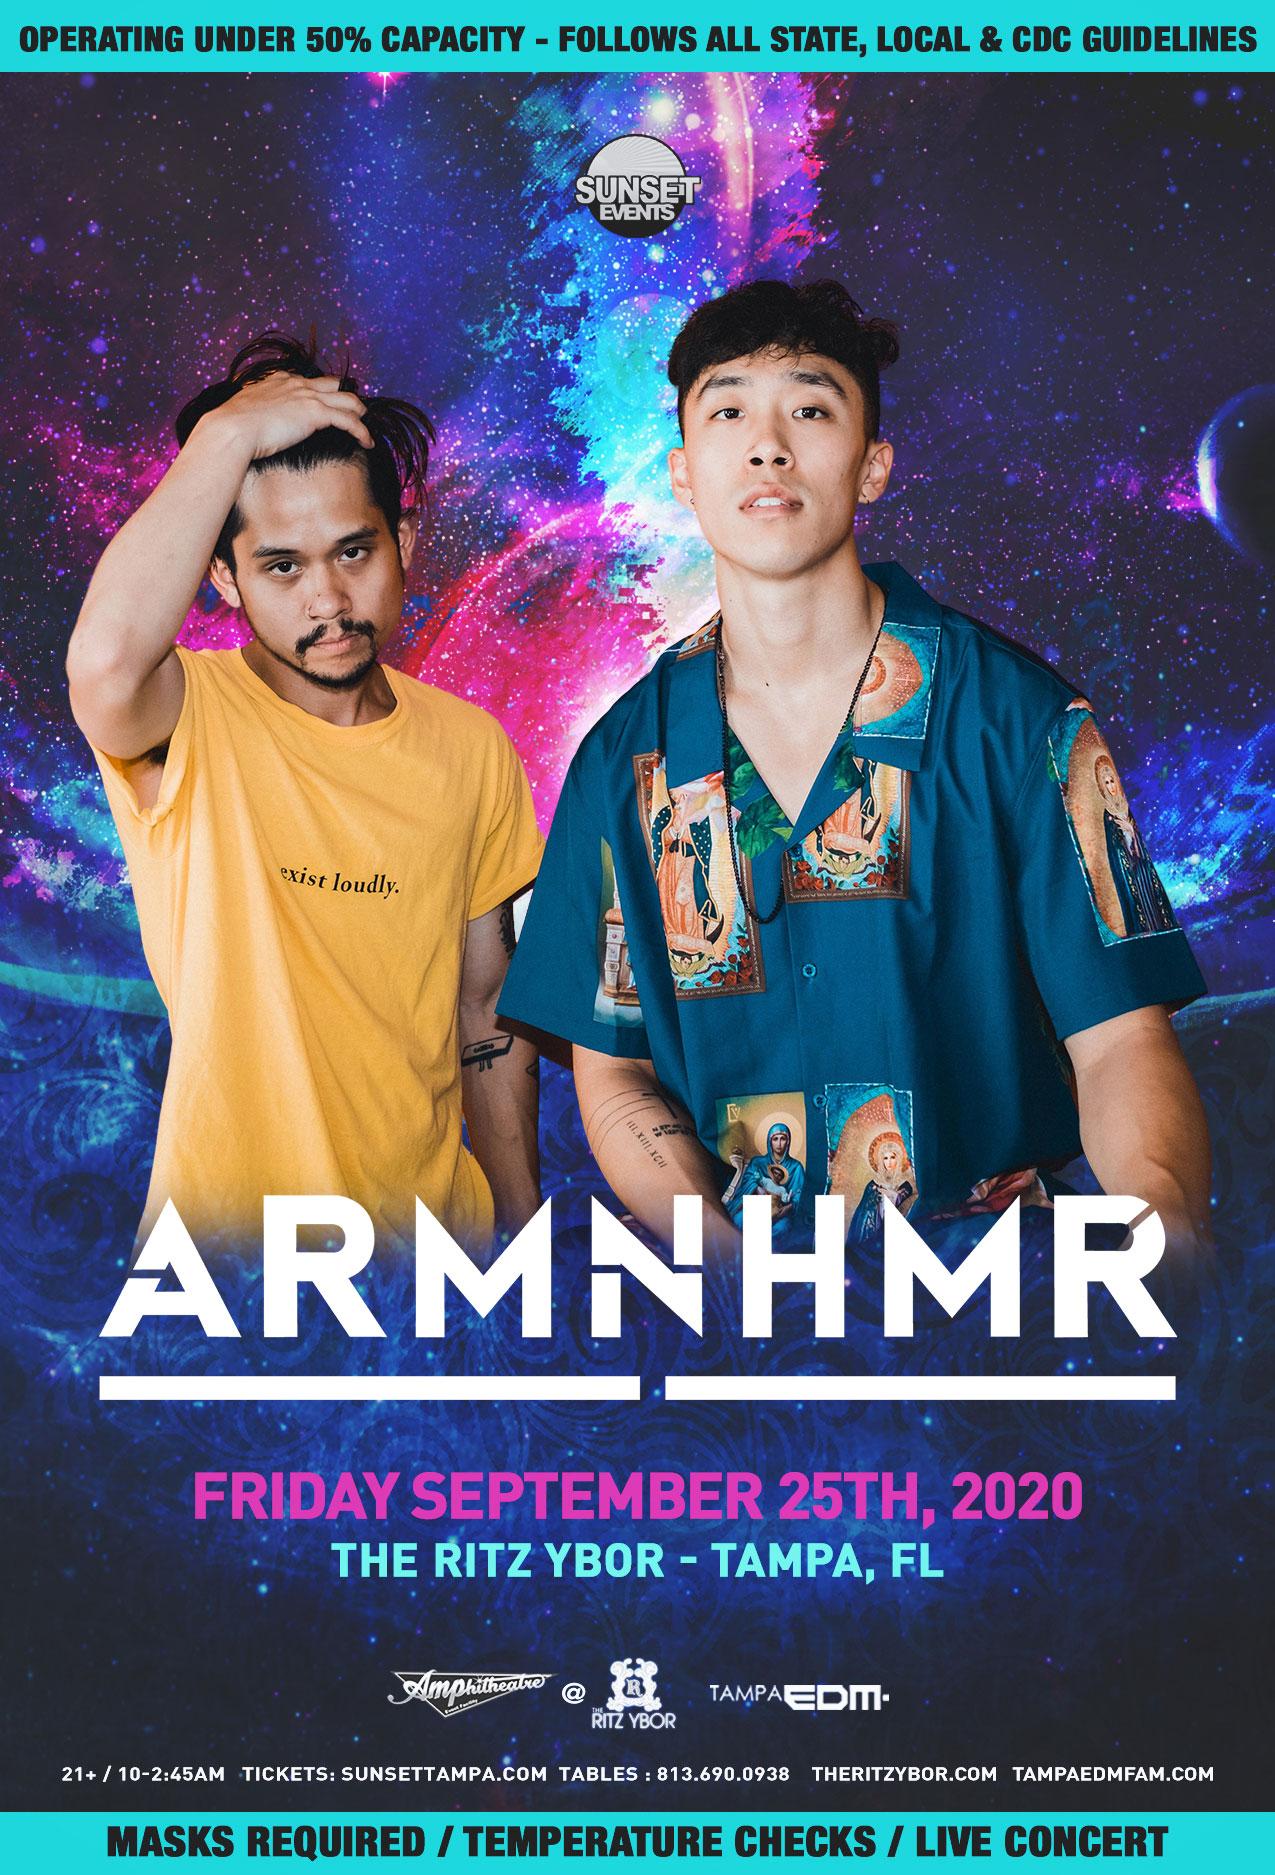 ARMNHMR for #POUND Fridays at The RITZ Ybor – 9/25/2020